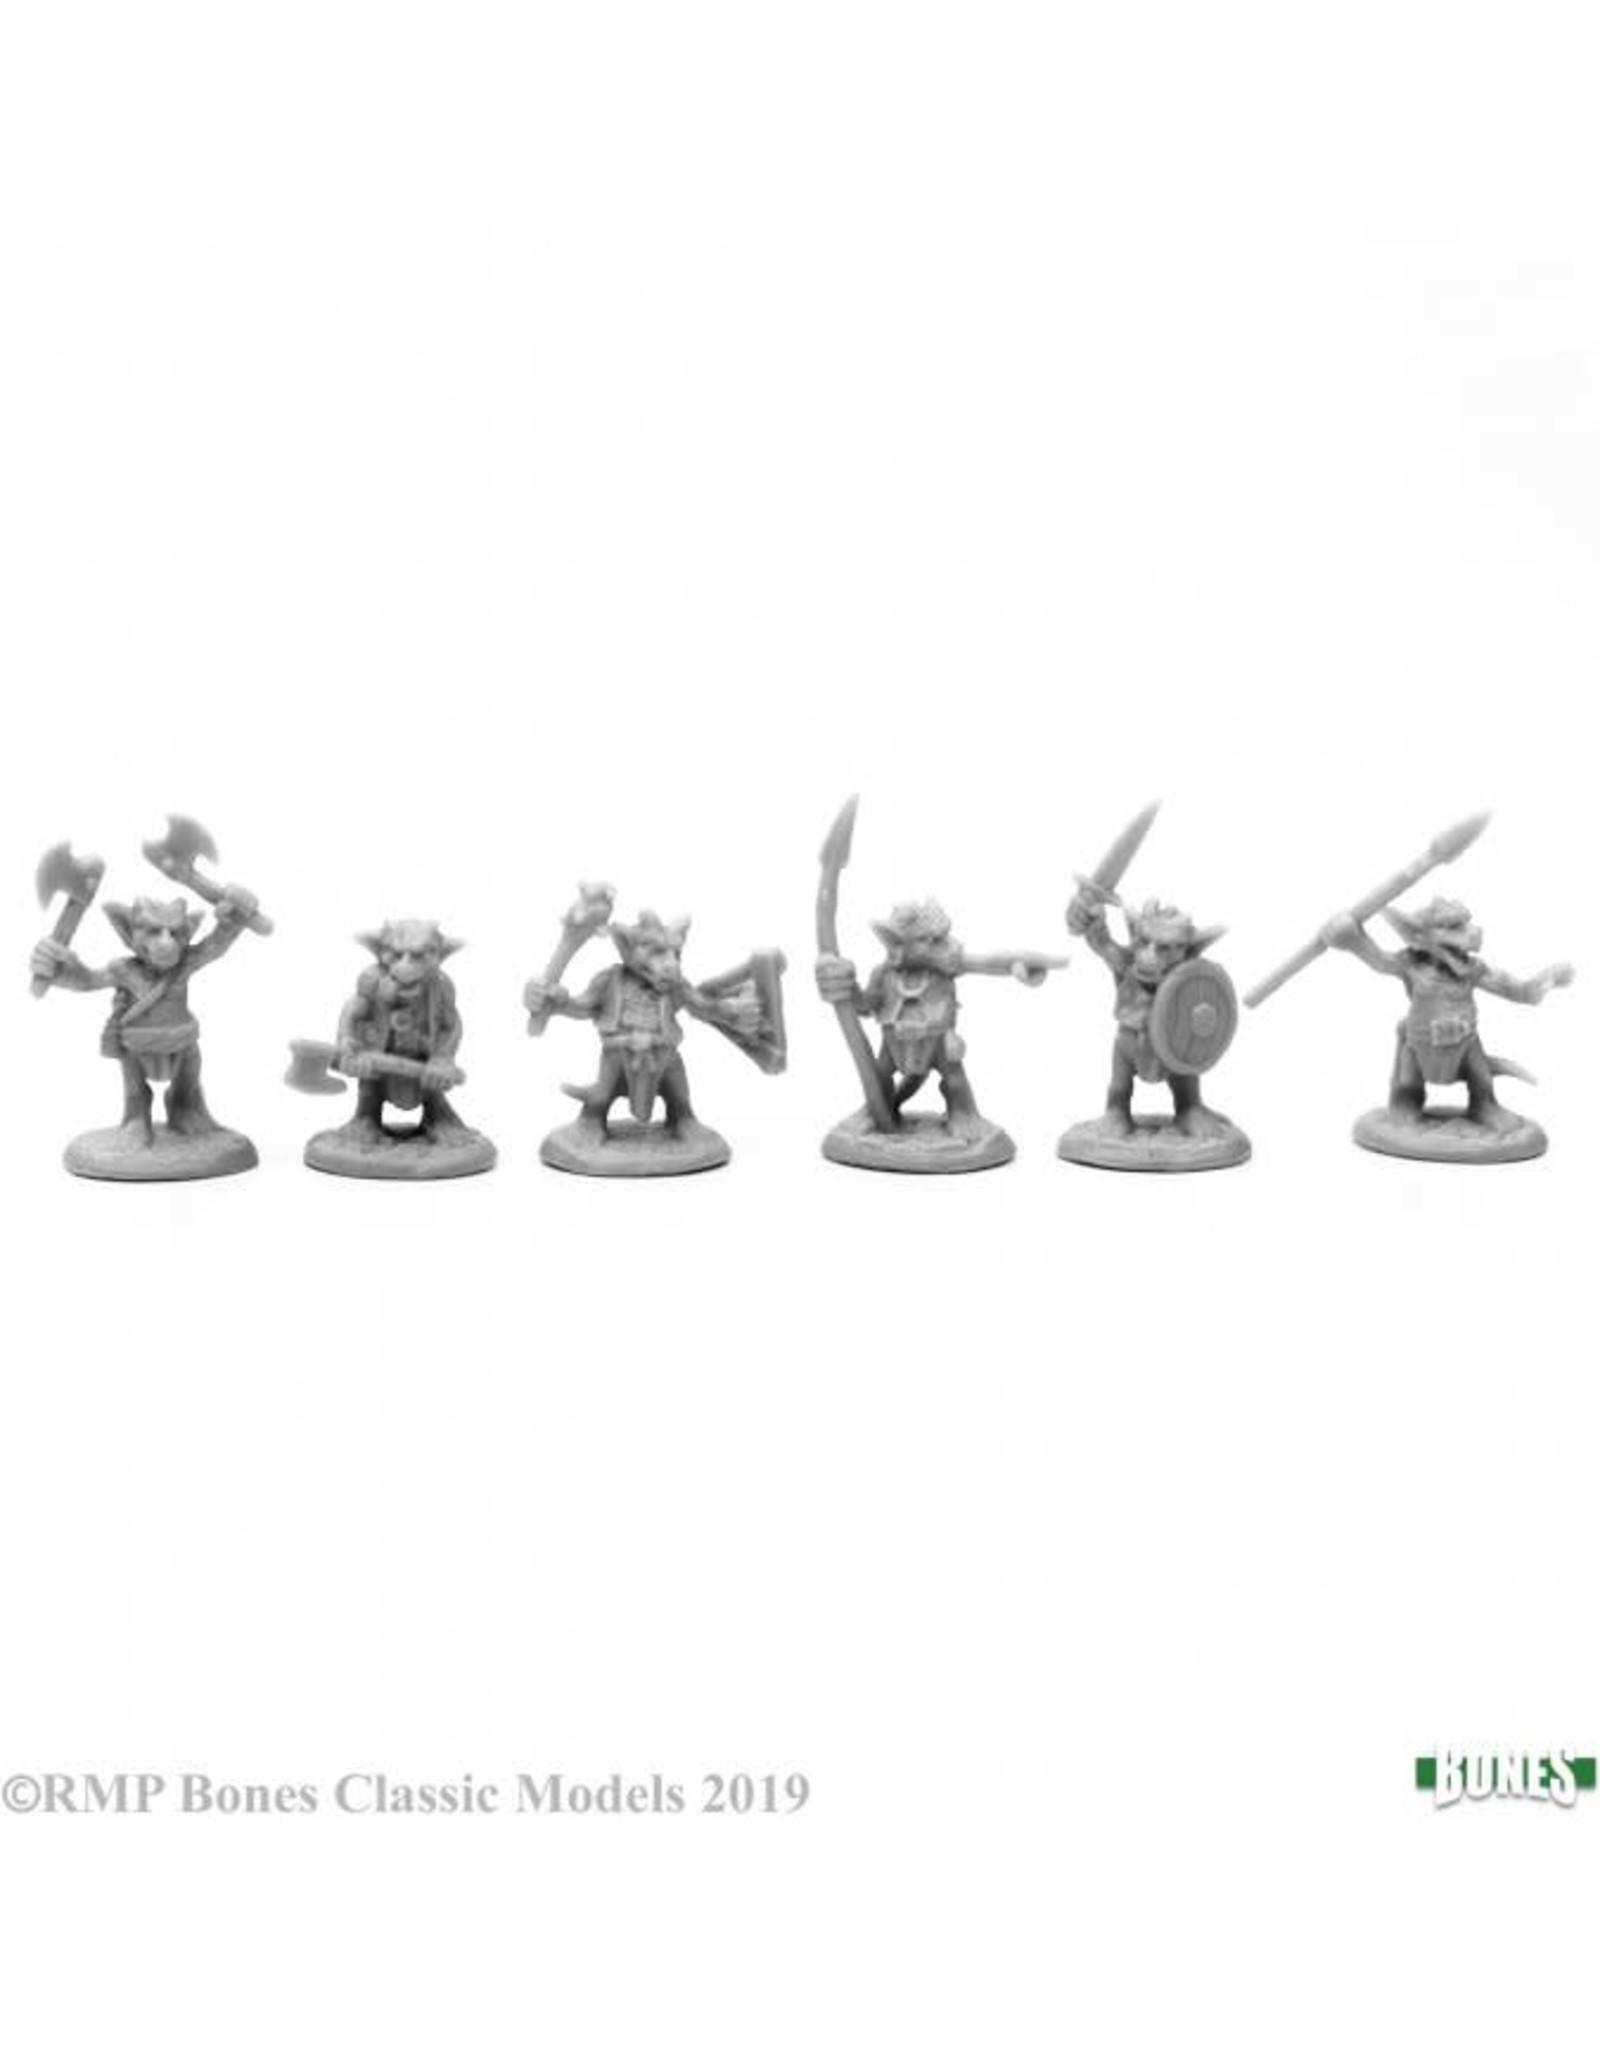 Reaper Miniatures Bones: Kobold Mooks